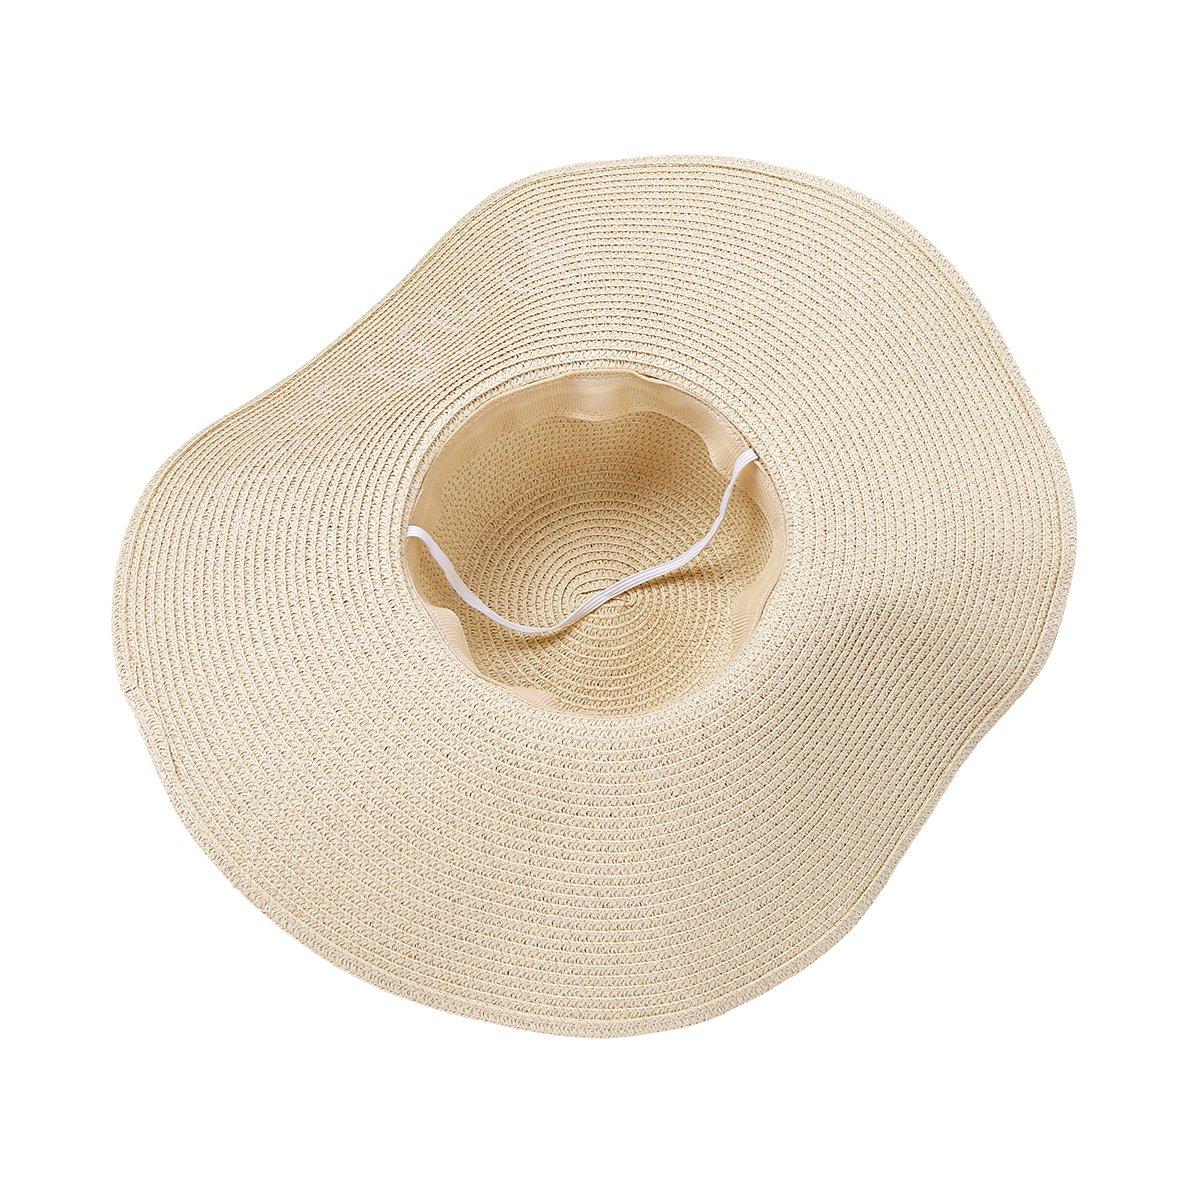 a1e76255467 iiniim Women Grils Beach Sun Hat Floppy Summer Cap Straw Foldable Wide Brim  Hat Beige One Size at Amazon Women s Clothing store